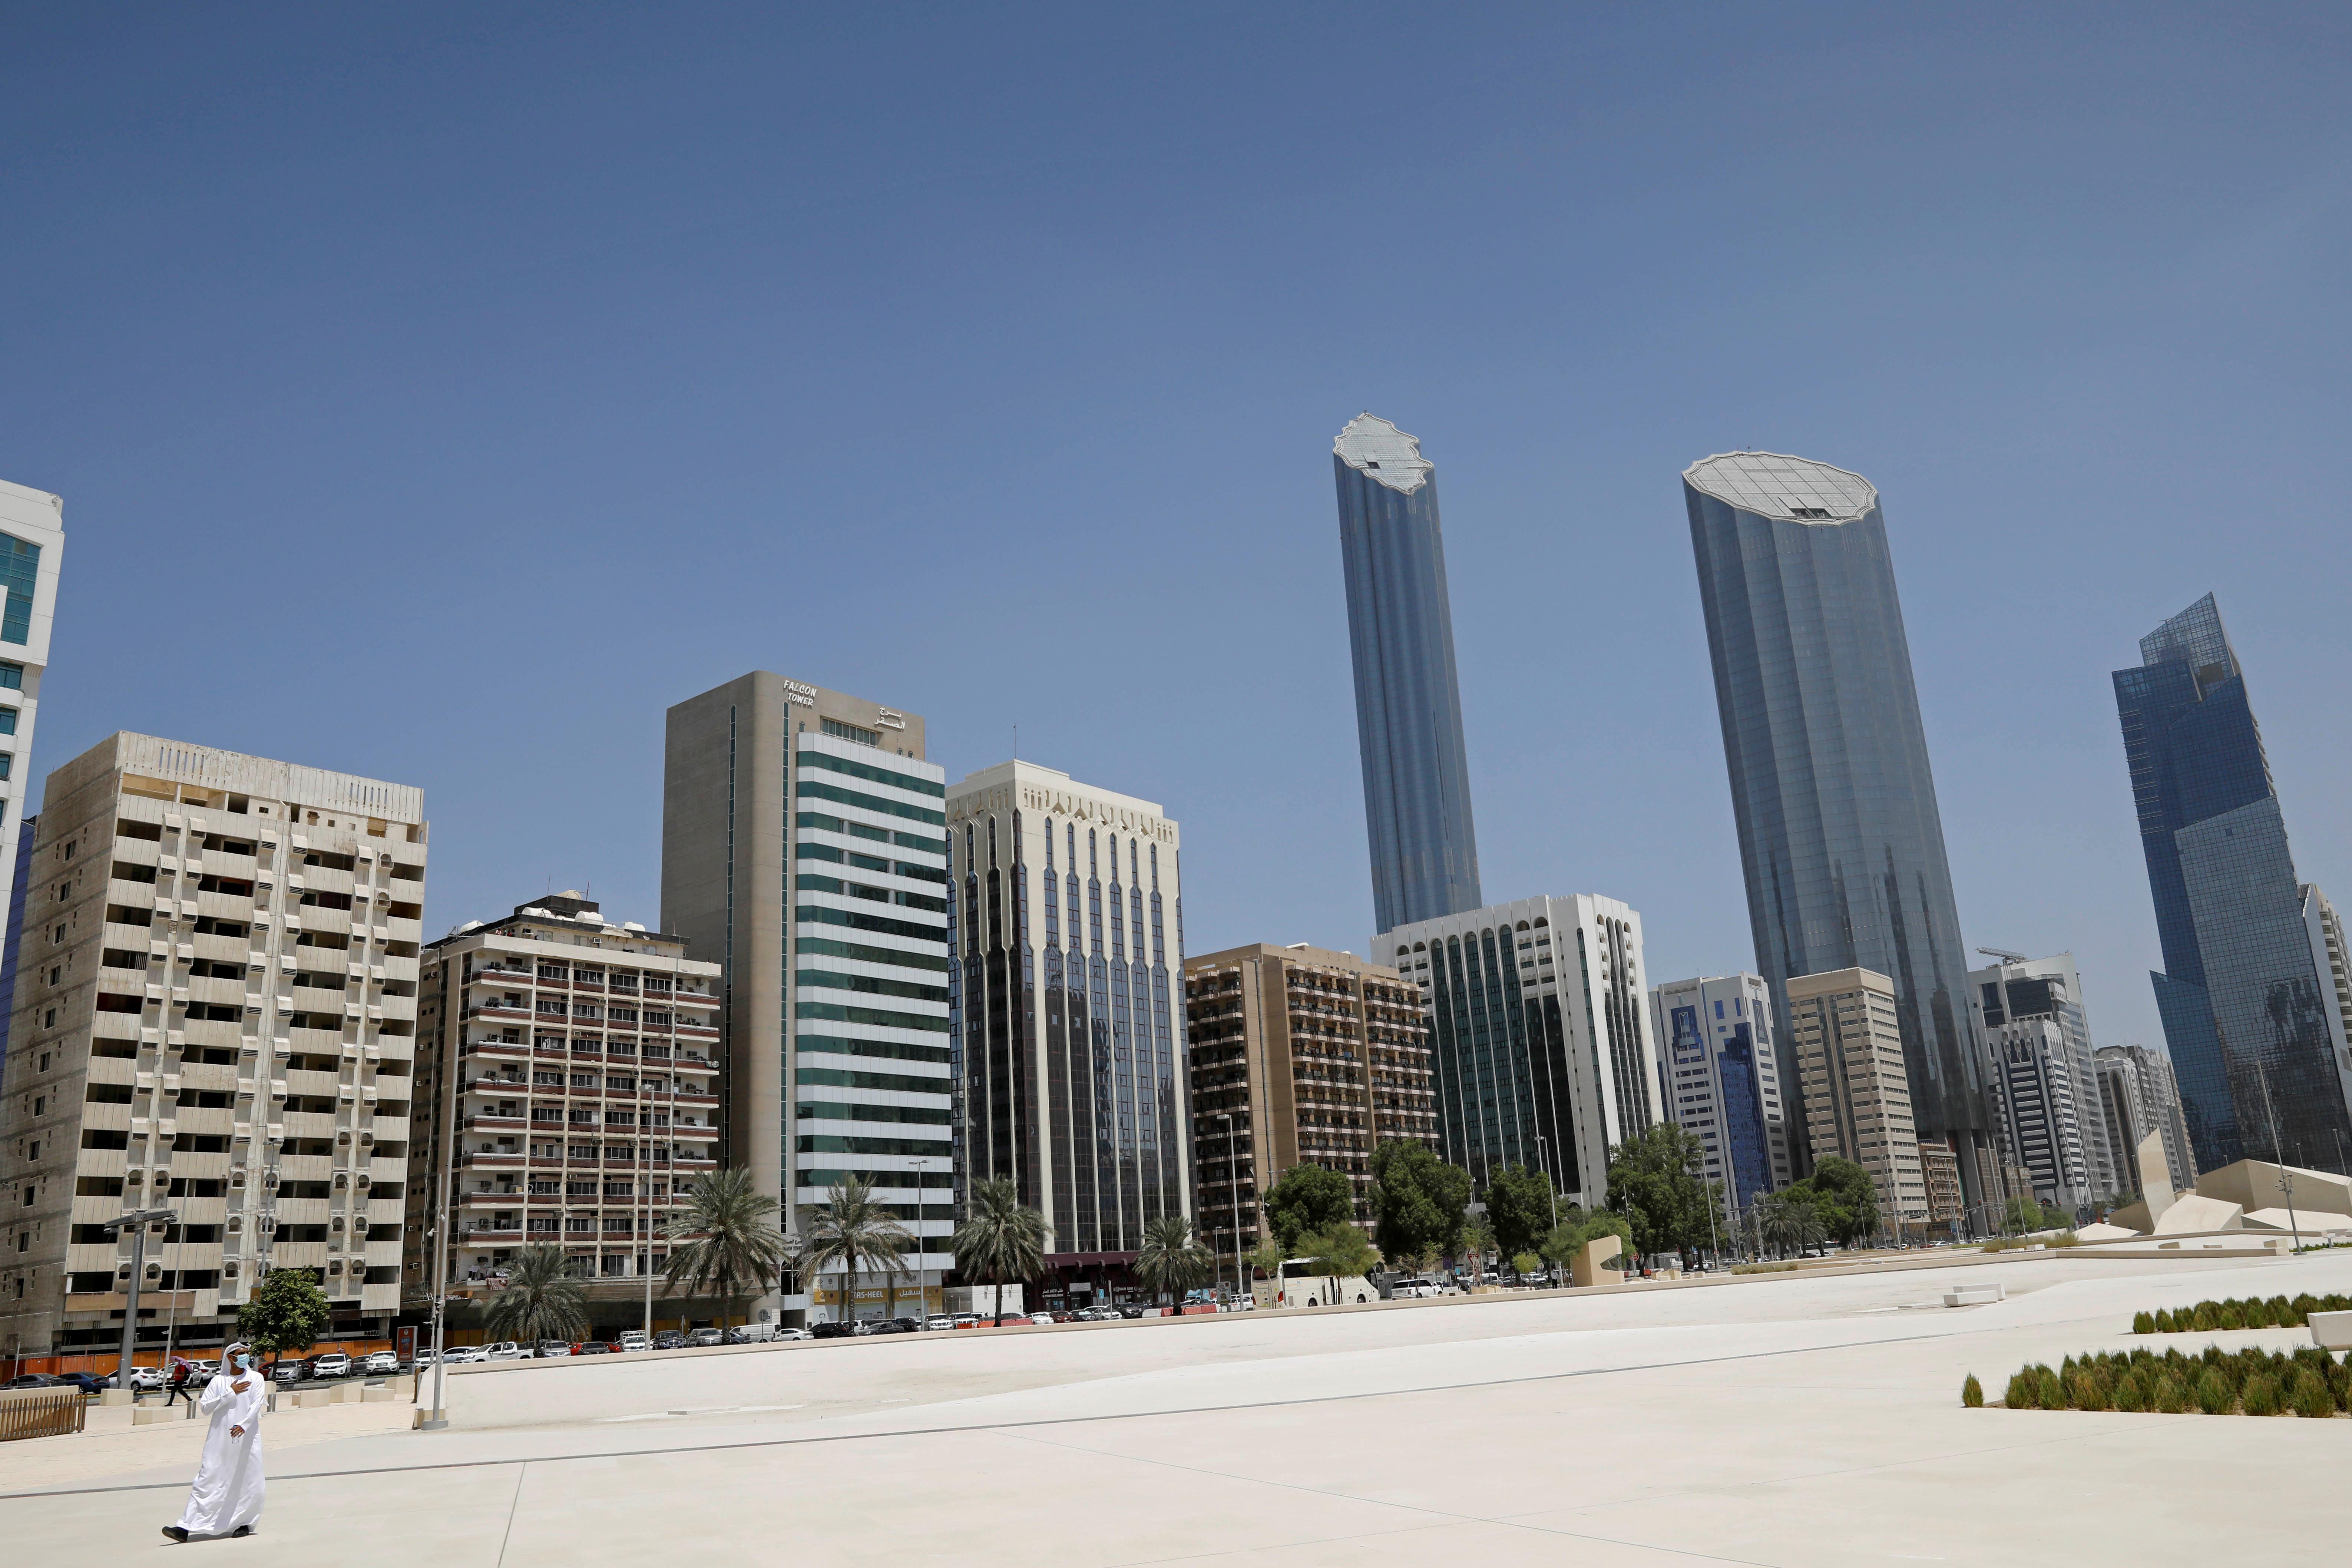 An Emirati man wears a protective mask as he walks past buildings in Abu Dhabi, United Arab Emirates September 1, 2020. REUTERS/Nir Elias/Pool/File Photo